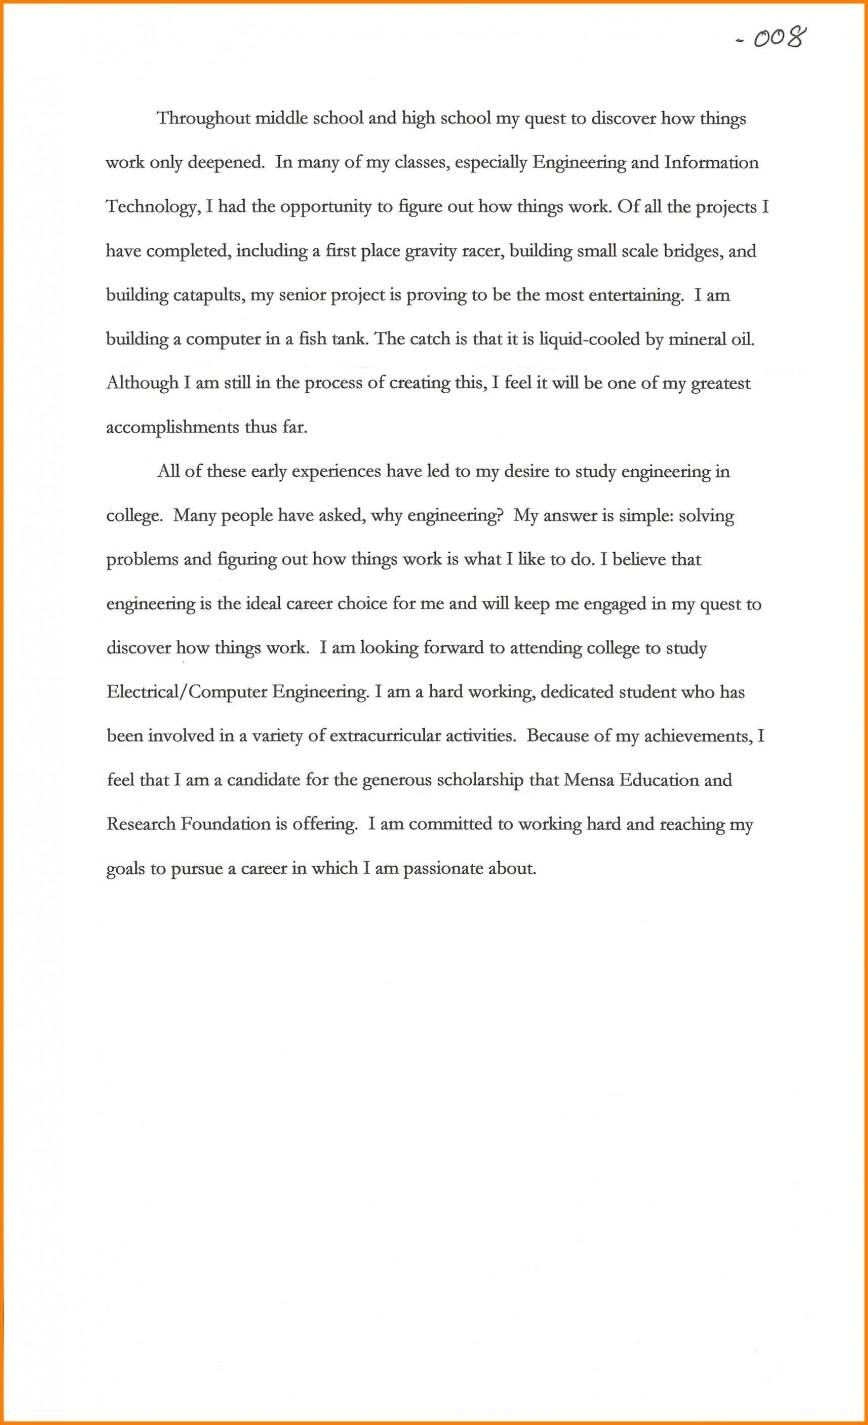 005 Educational Goals Essay Joshua Cate Stunning Public Education And Career Sample Professional